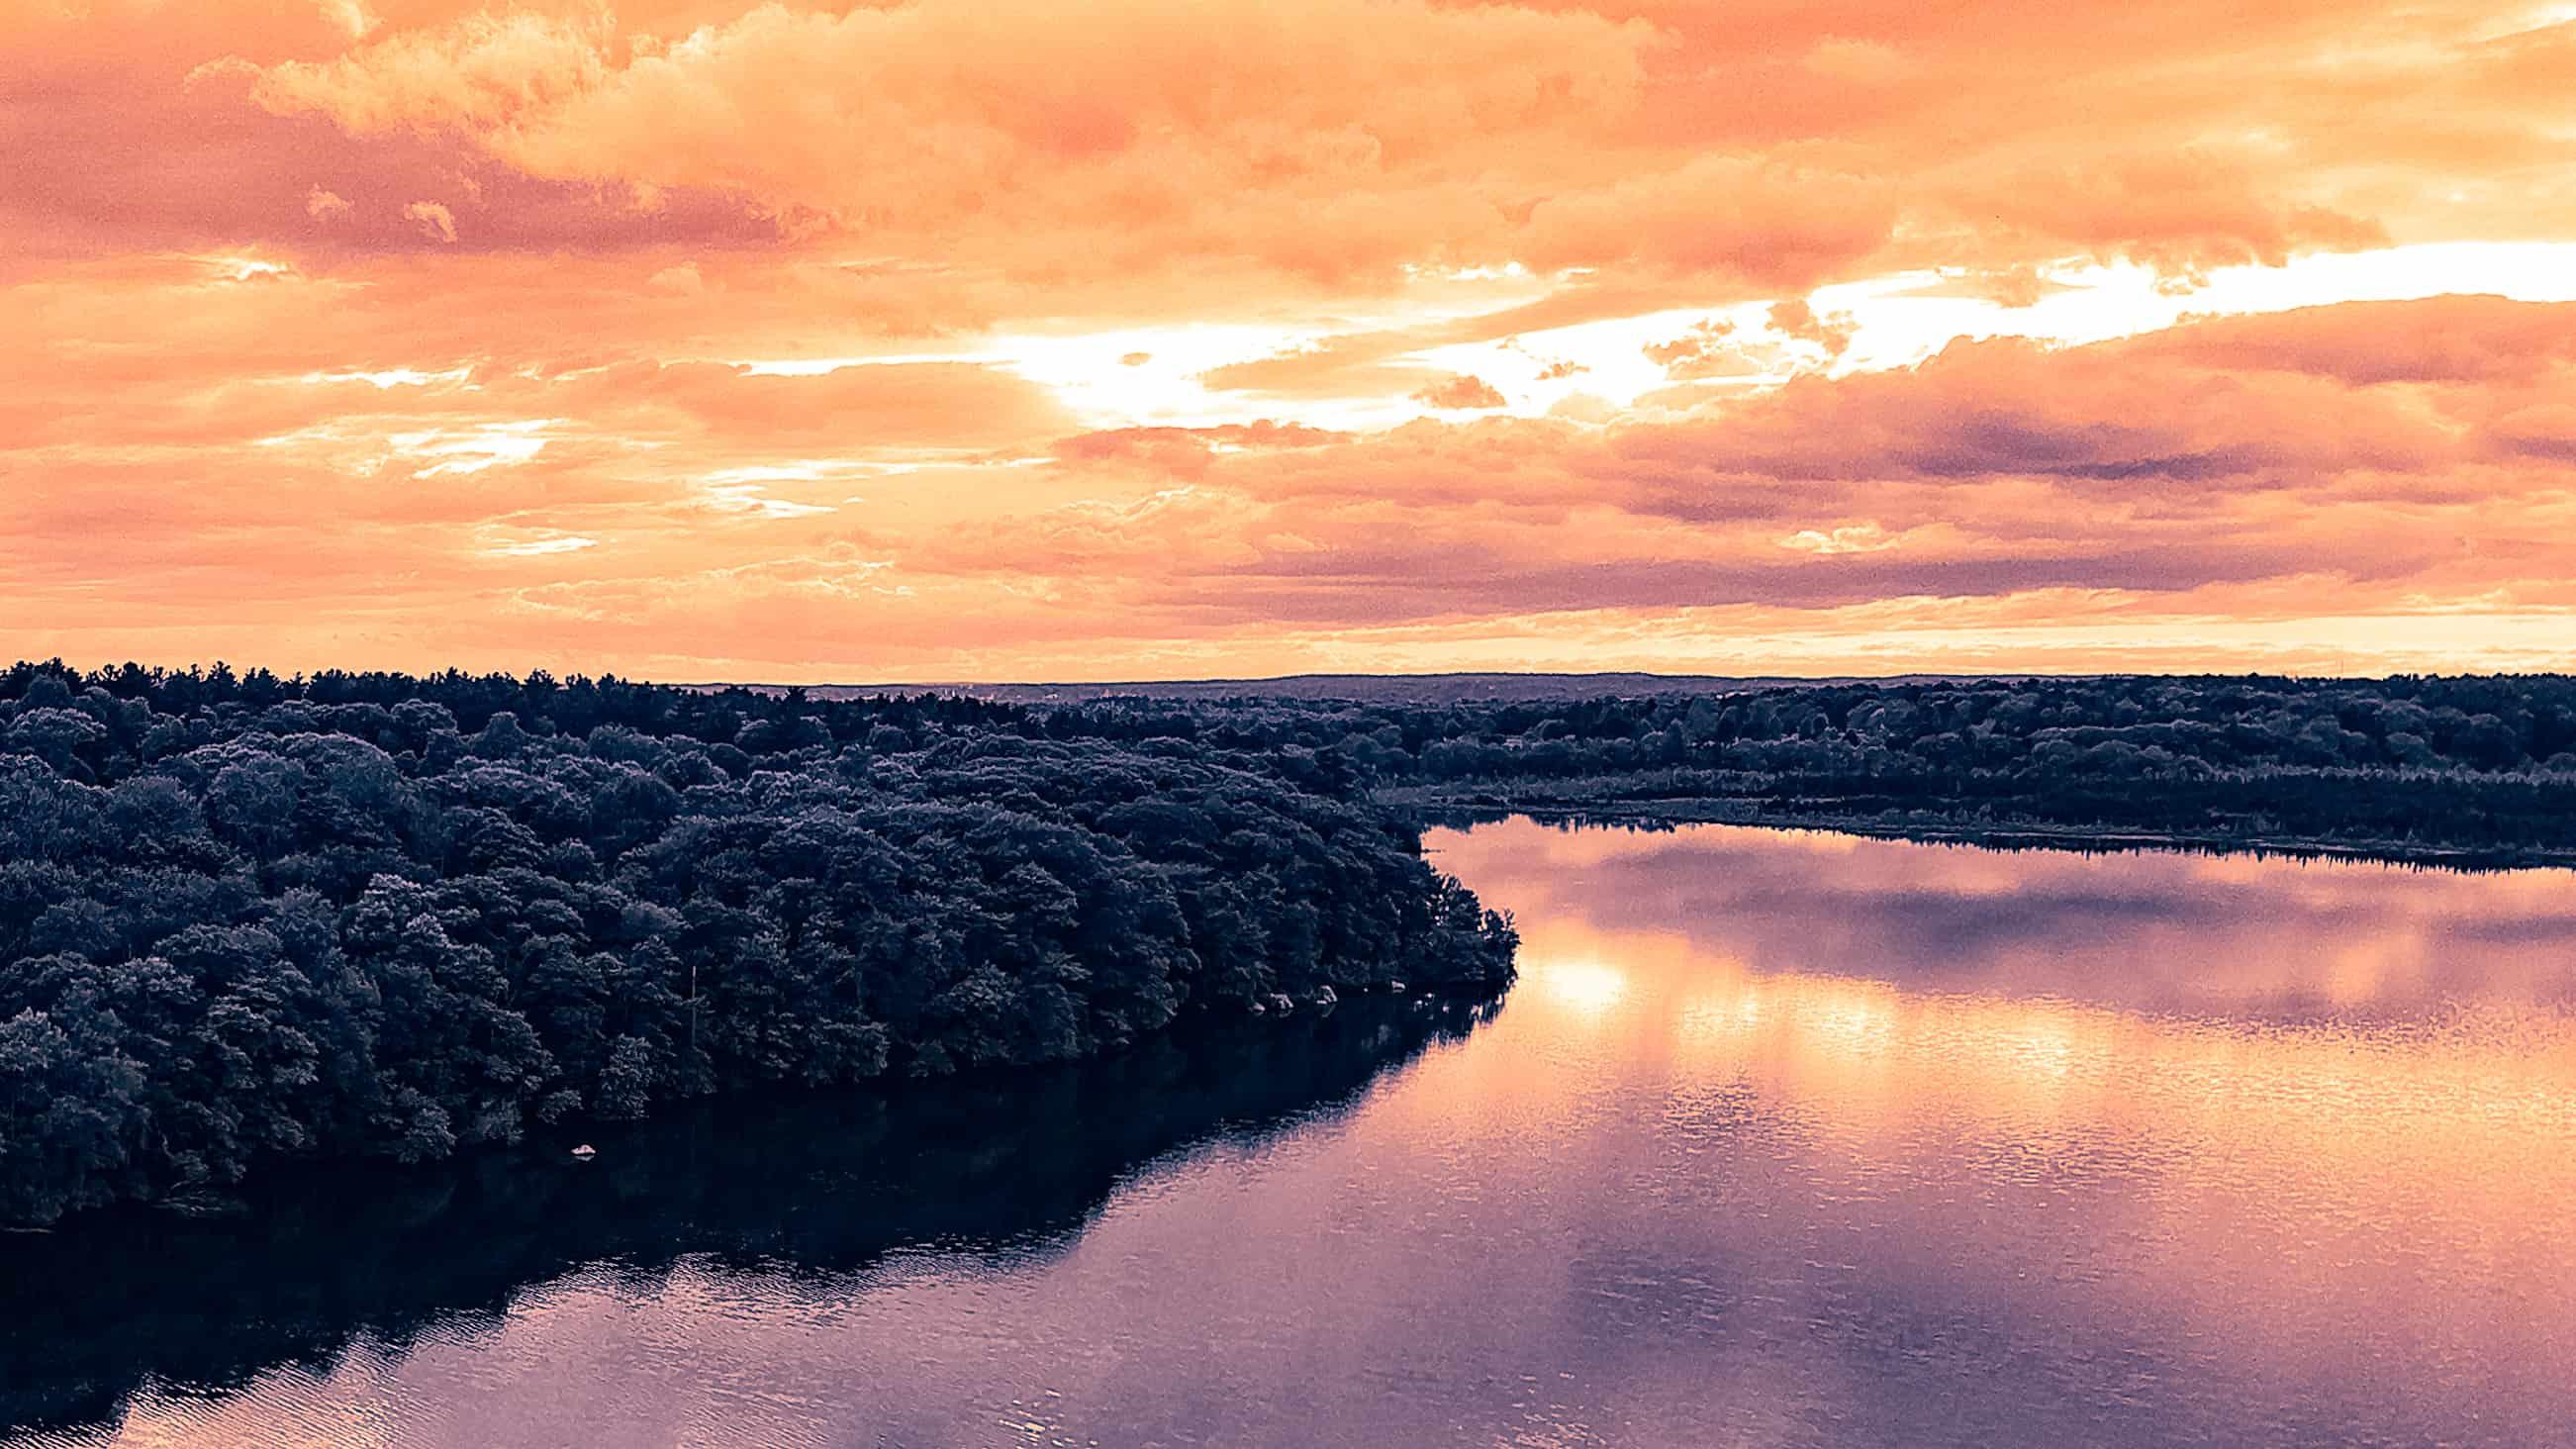 ponkapoag pink sky